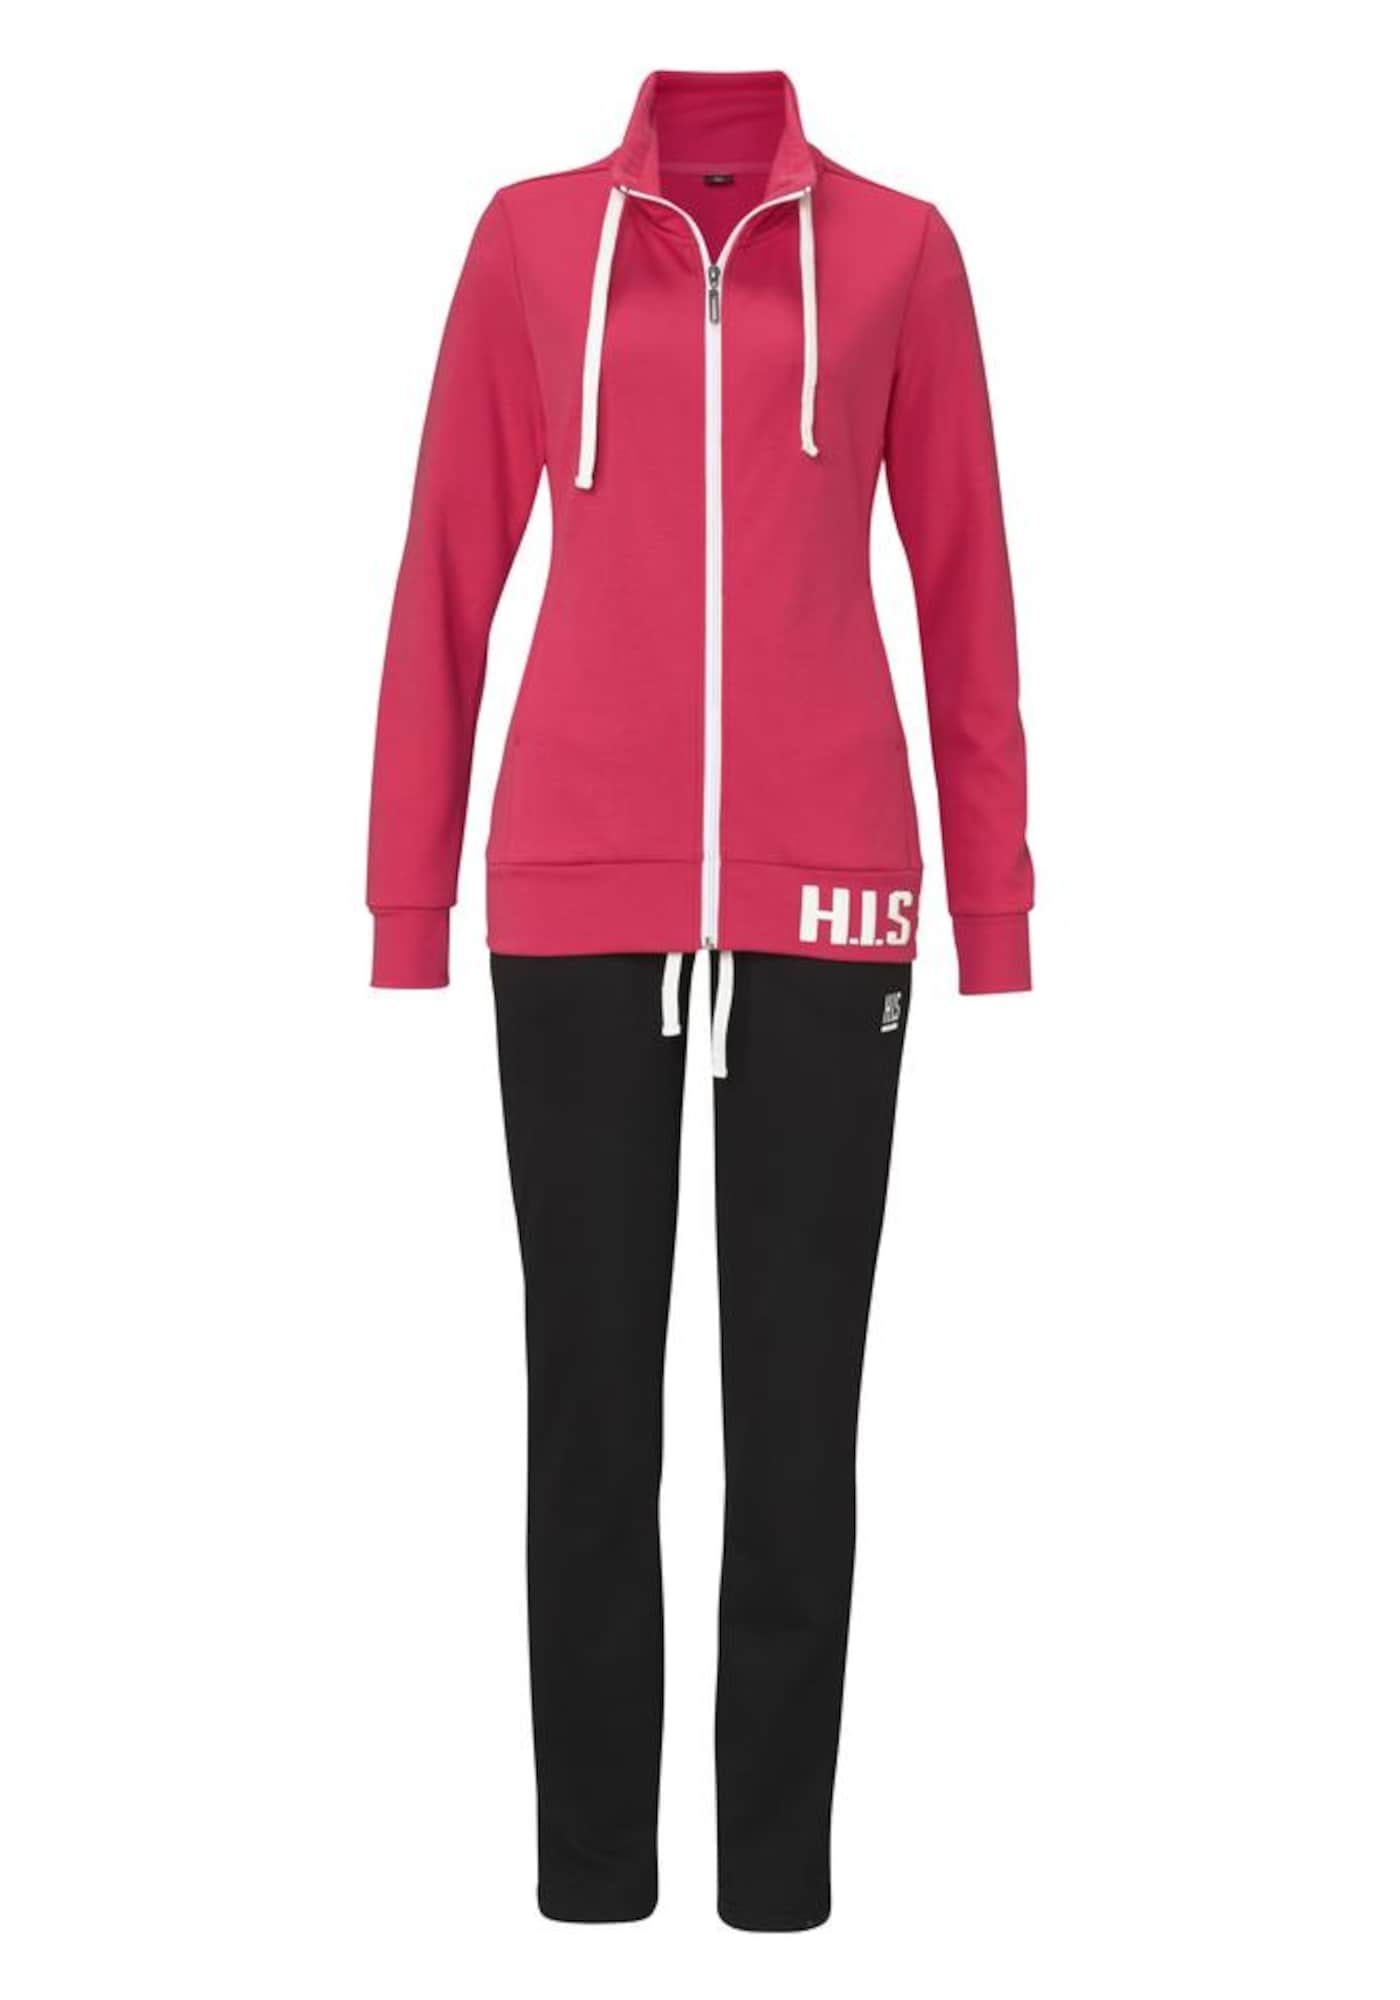 Jogginganzug | Sportbekleidung > Sportanzüge > Jogginganzüge | Schwarz | H.I.S